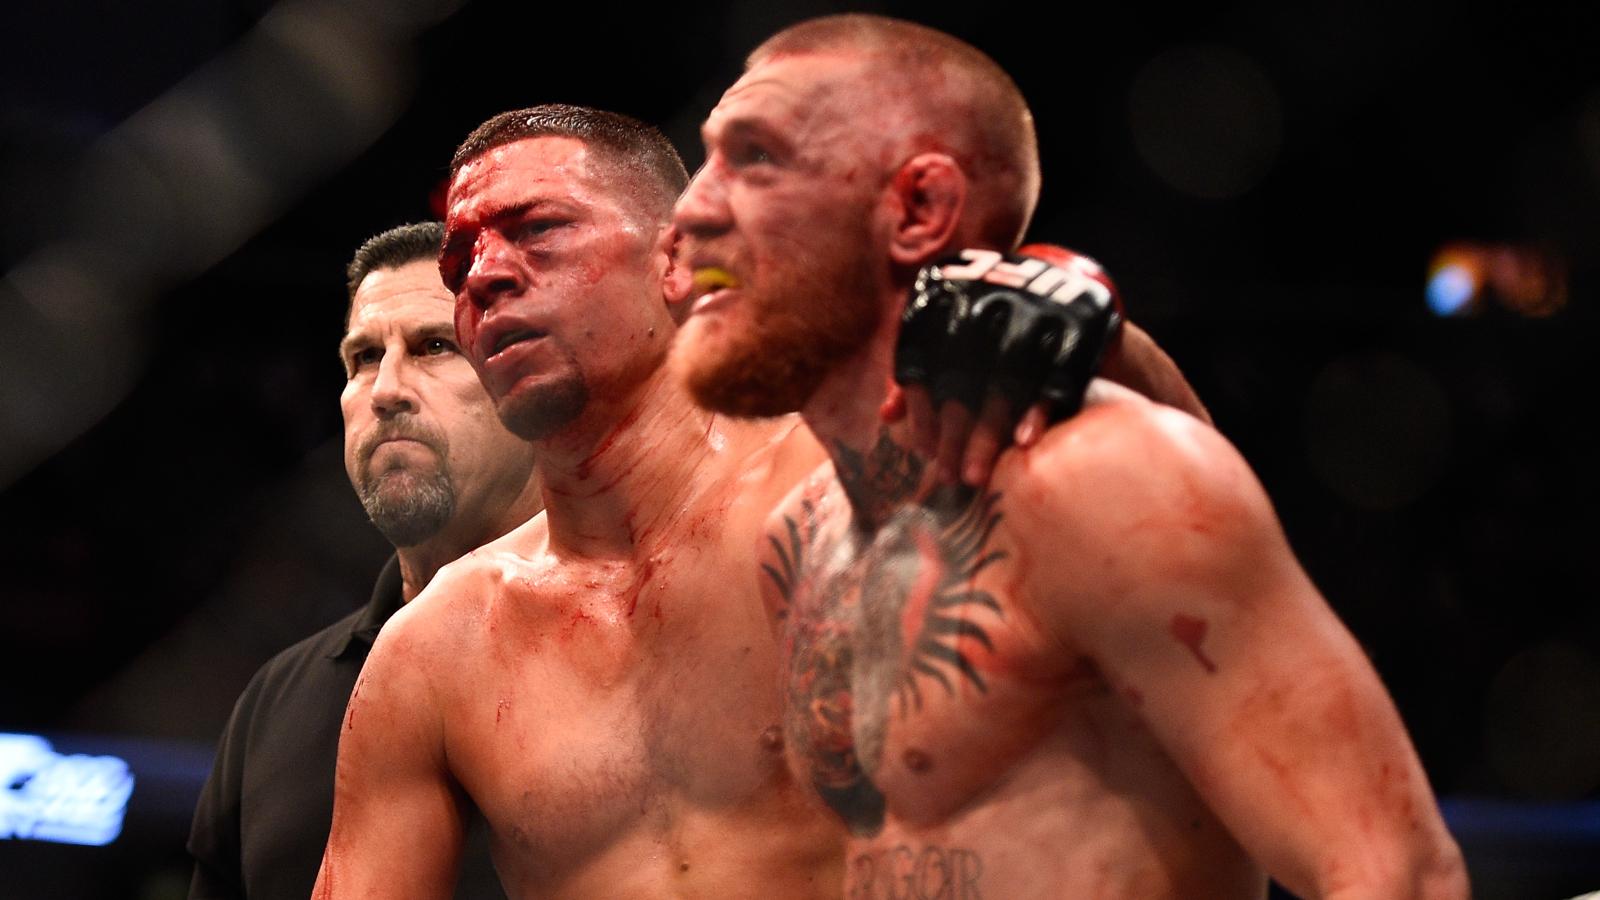 083116-UFC-Conor-McGregor-Nate-Diaz